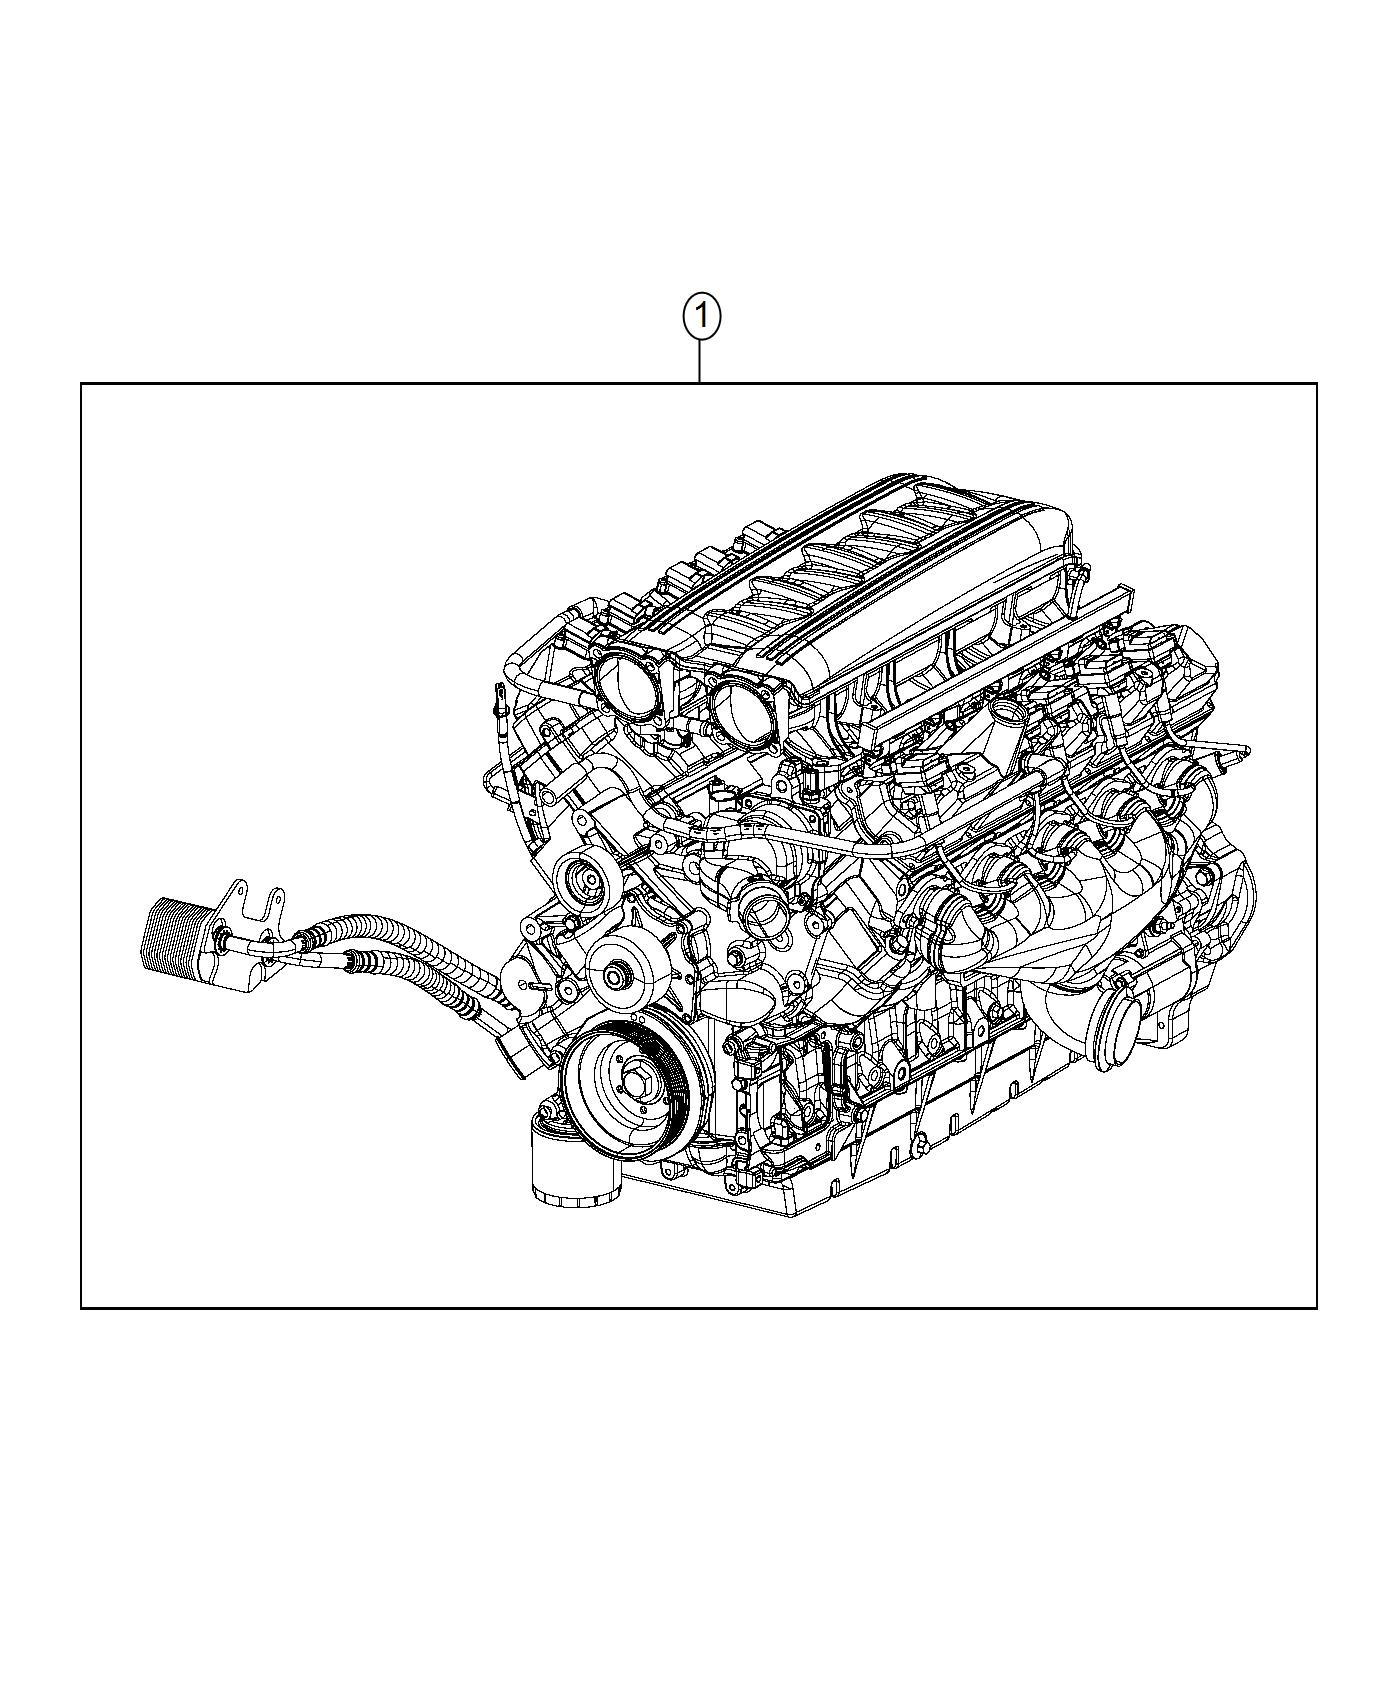 Diagram Ford V10 Alternator Wiring Diagram Full Version